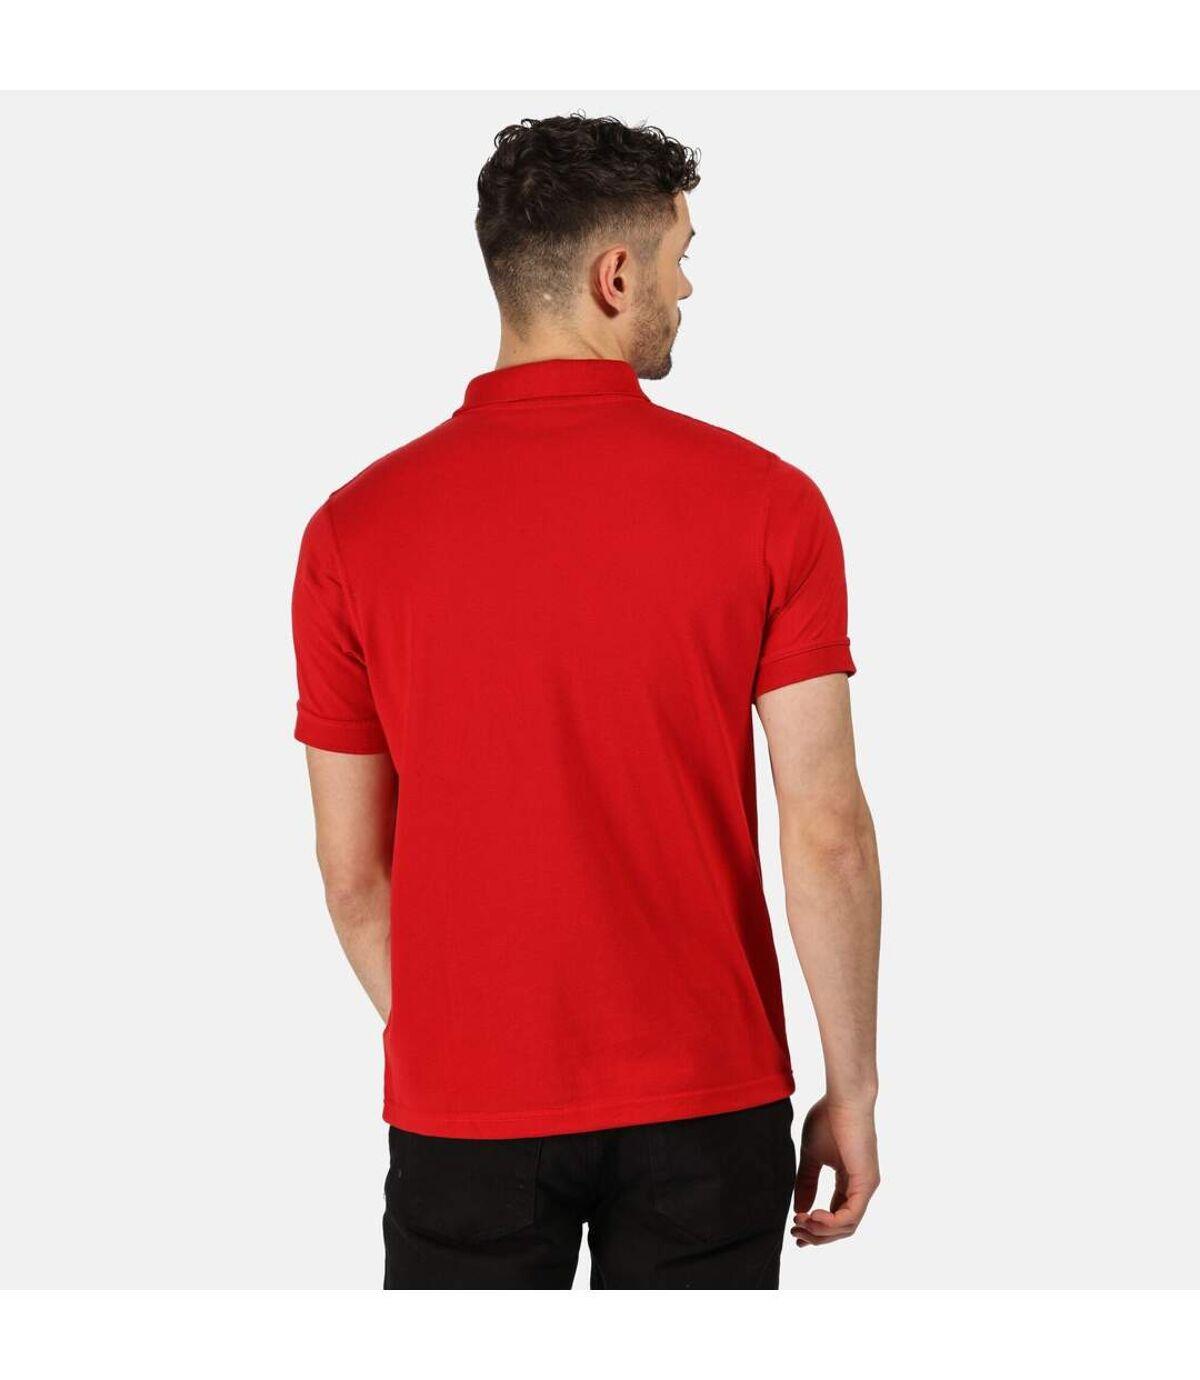 Regatta Classic Mens 65/35 Short Sleeve Polo Shirt (Classic Red) - UTRW4600